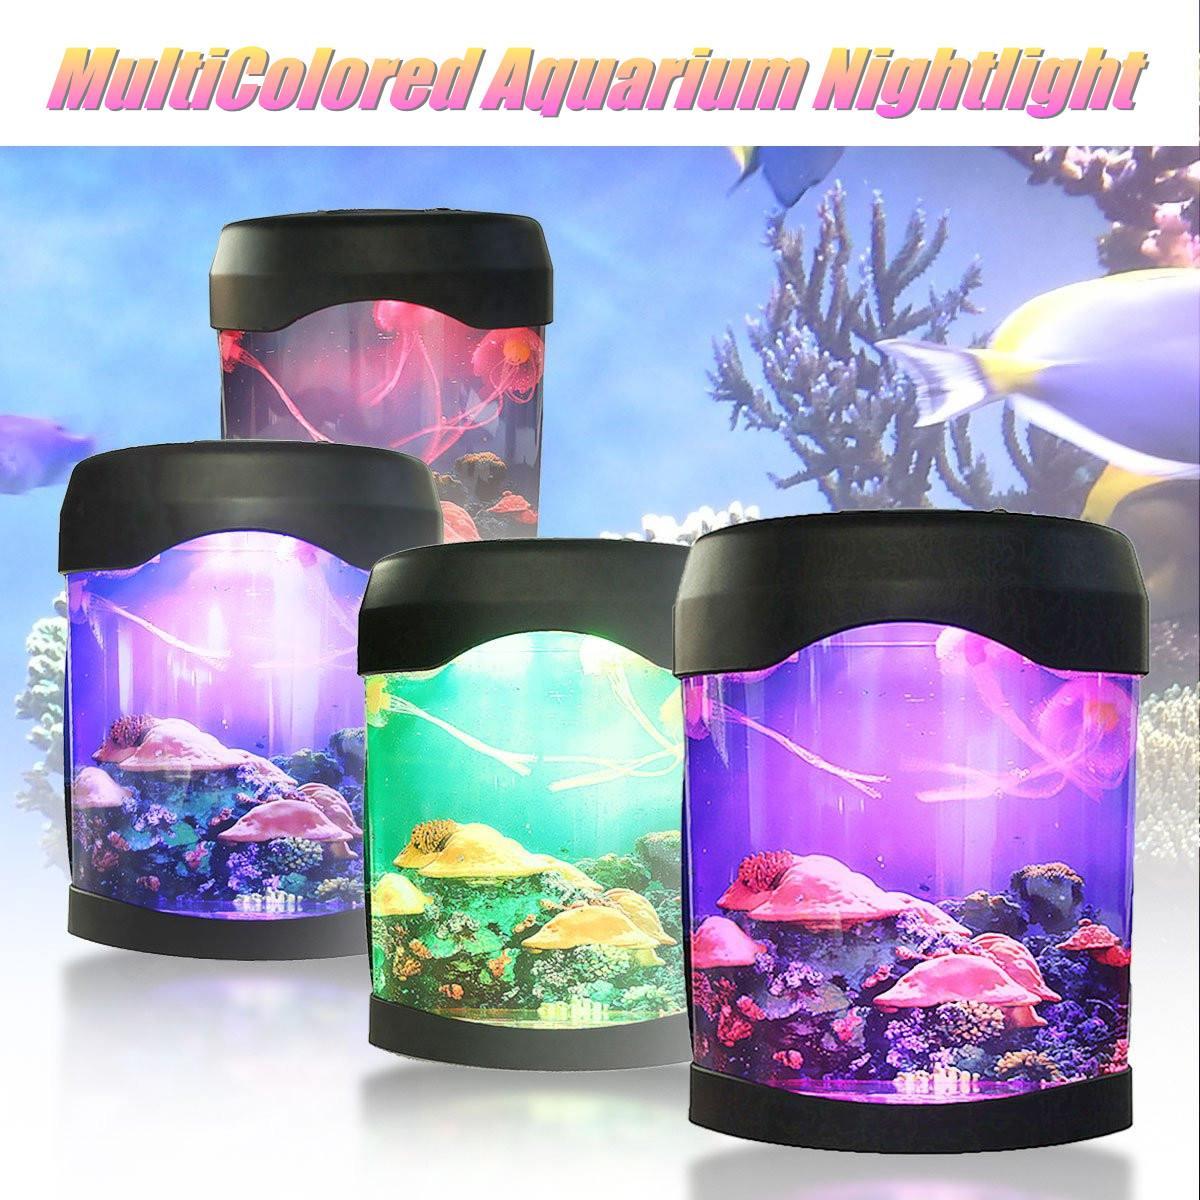 LED Colorful Jellyfish Tank Sea World Swimming Mood Lamp Nightlight MultiColored